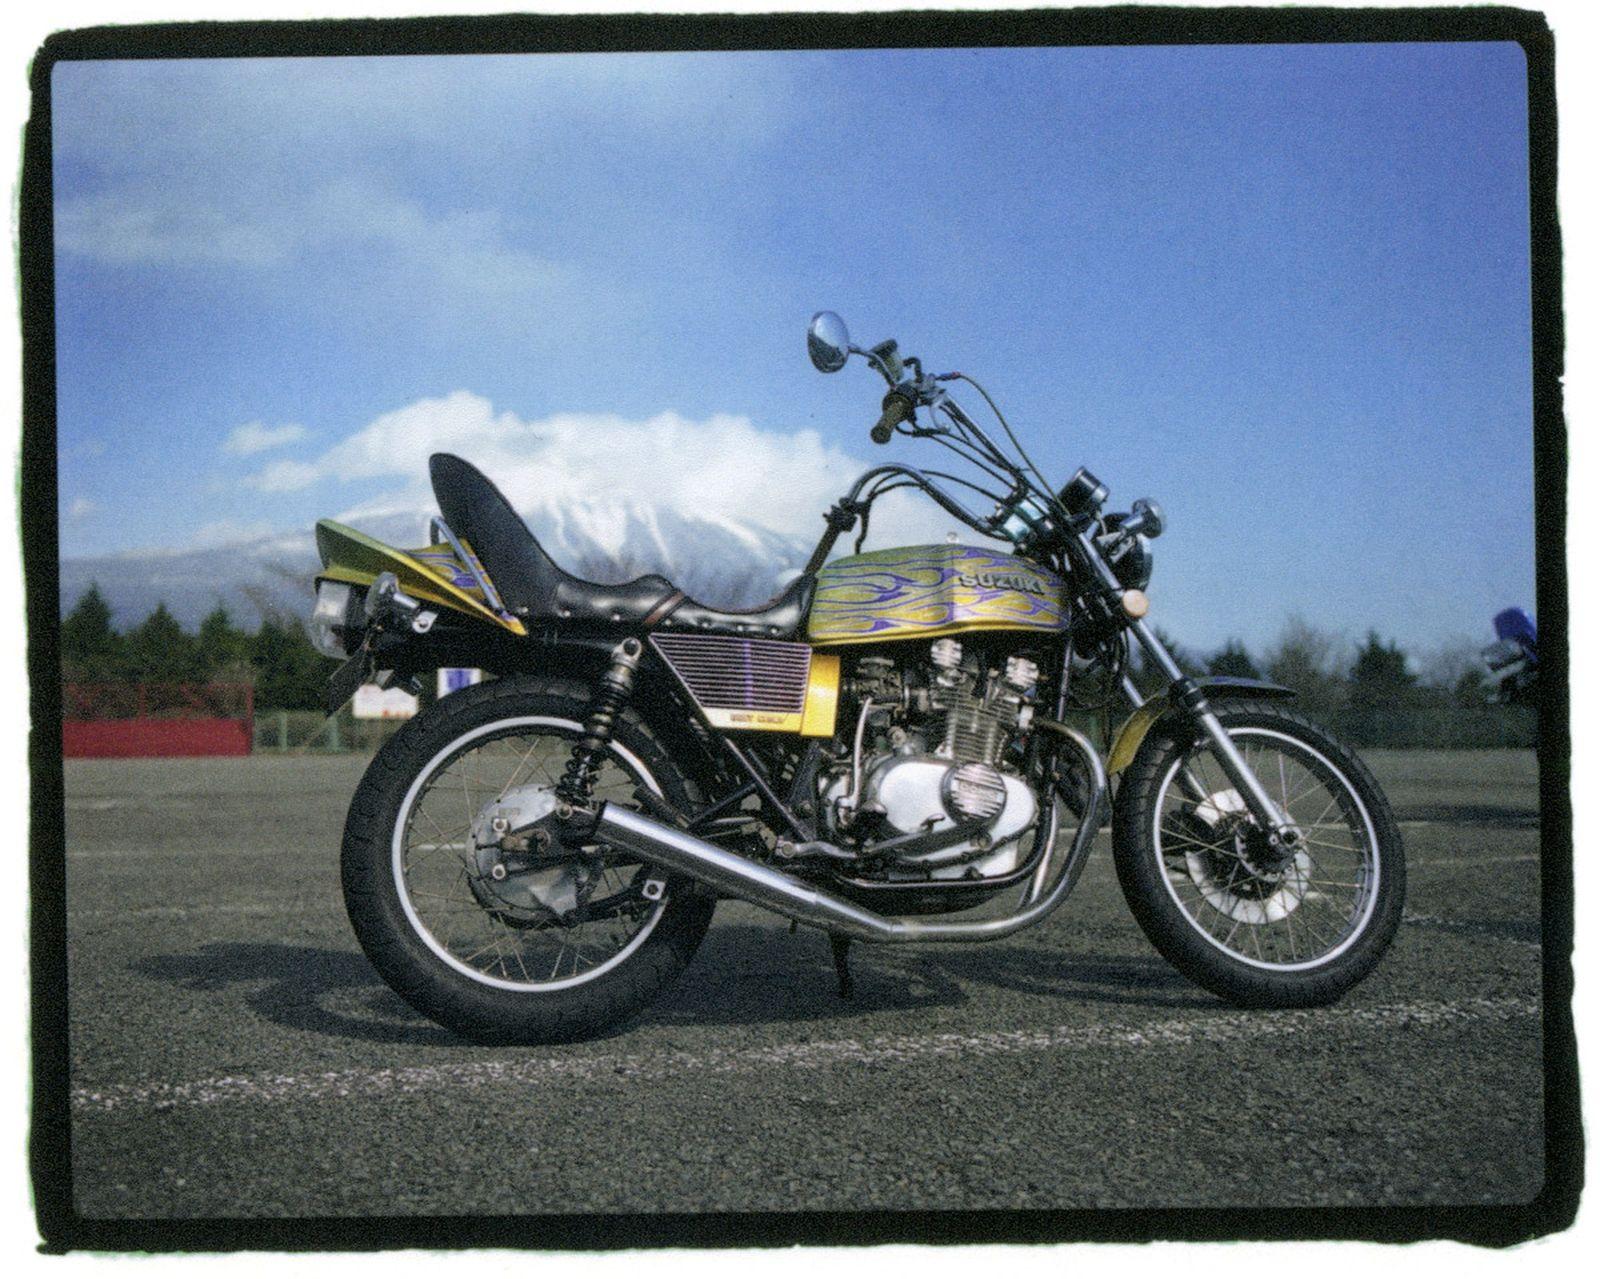 bosozoku-the-stylish-legacy-of-japans-rebel-motorcycle-gangs-5